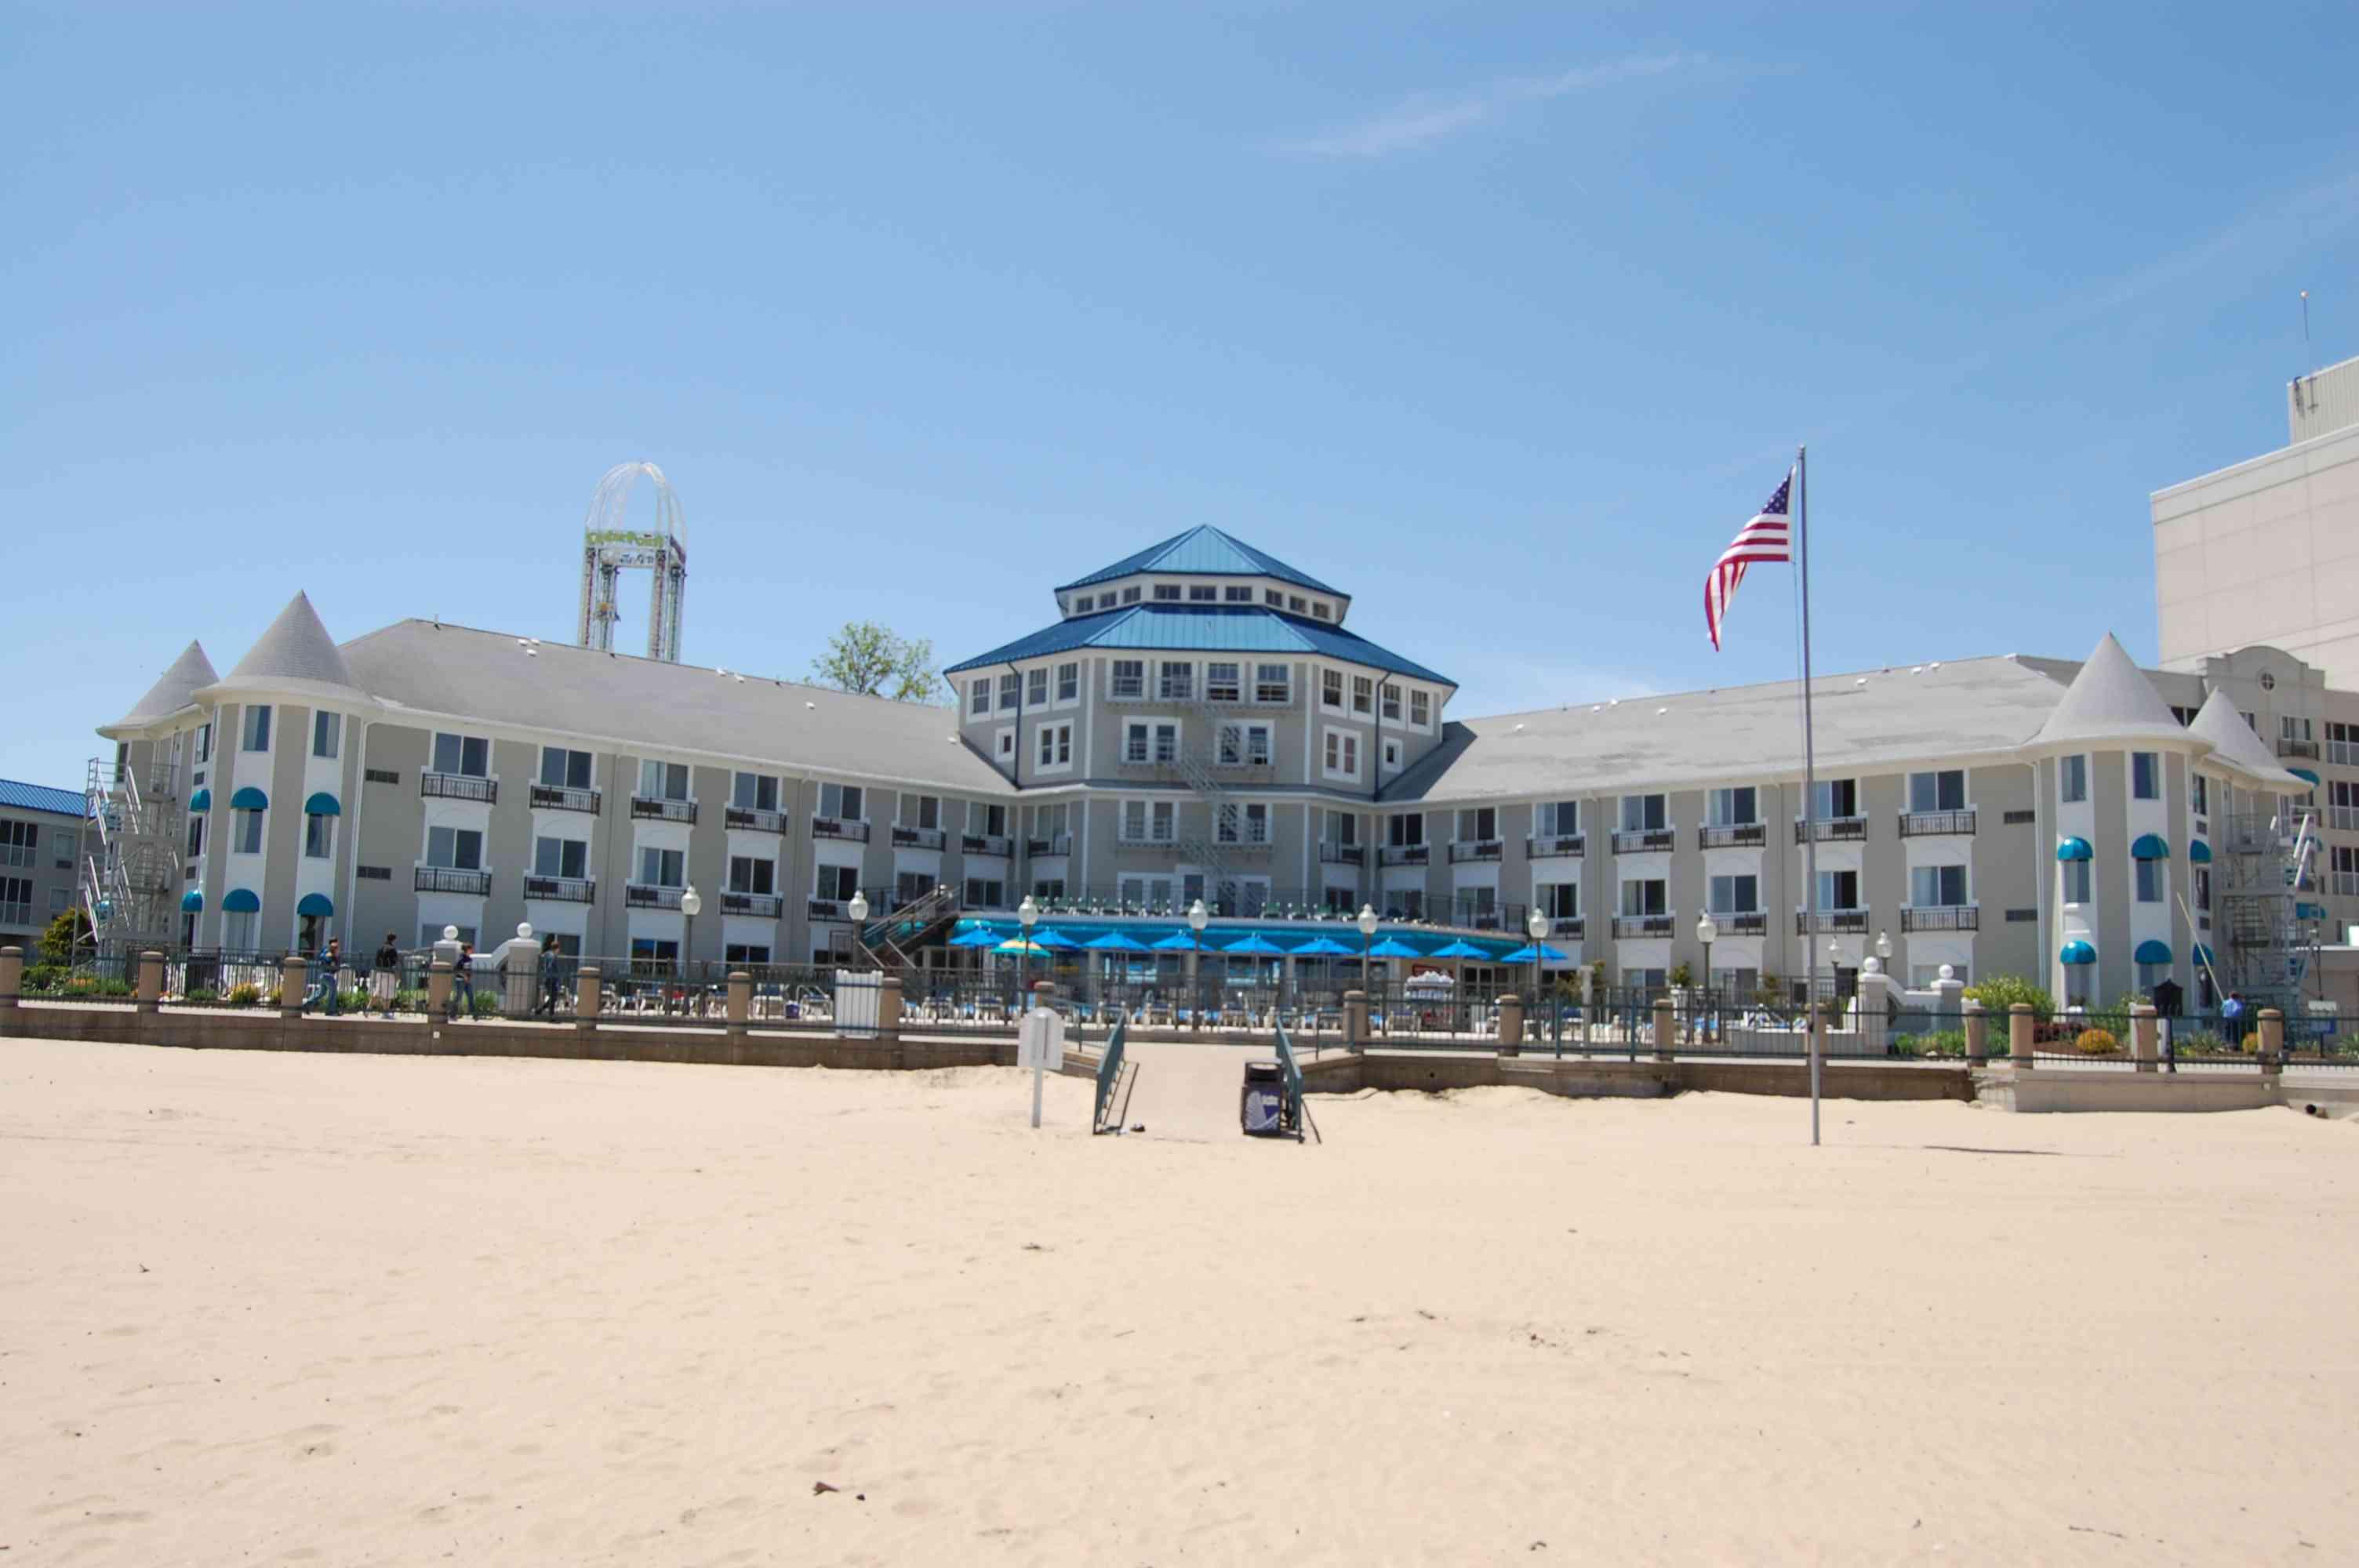 Cedar Point Hotel Breakers from the beach